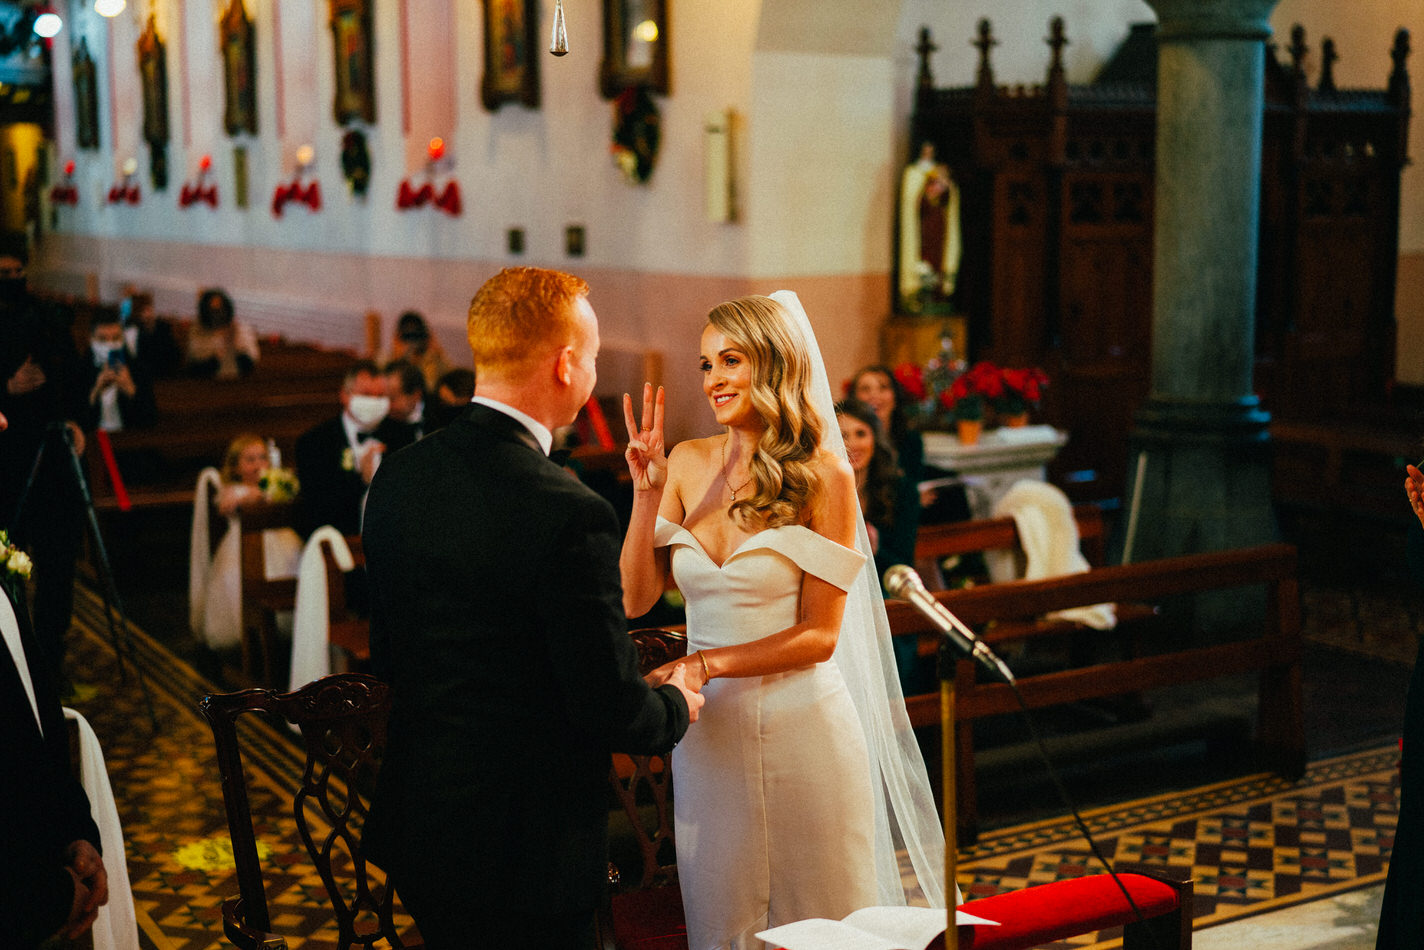 Castle-wedding-ireland-photos- 0131 88